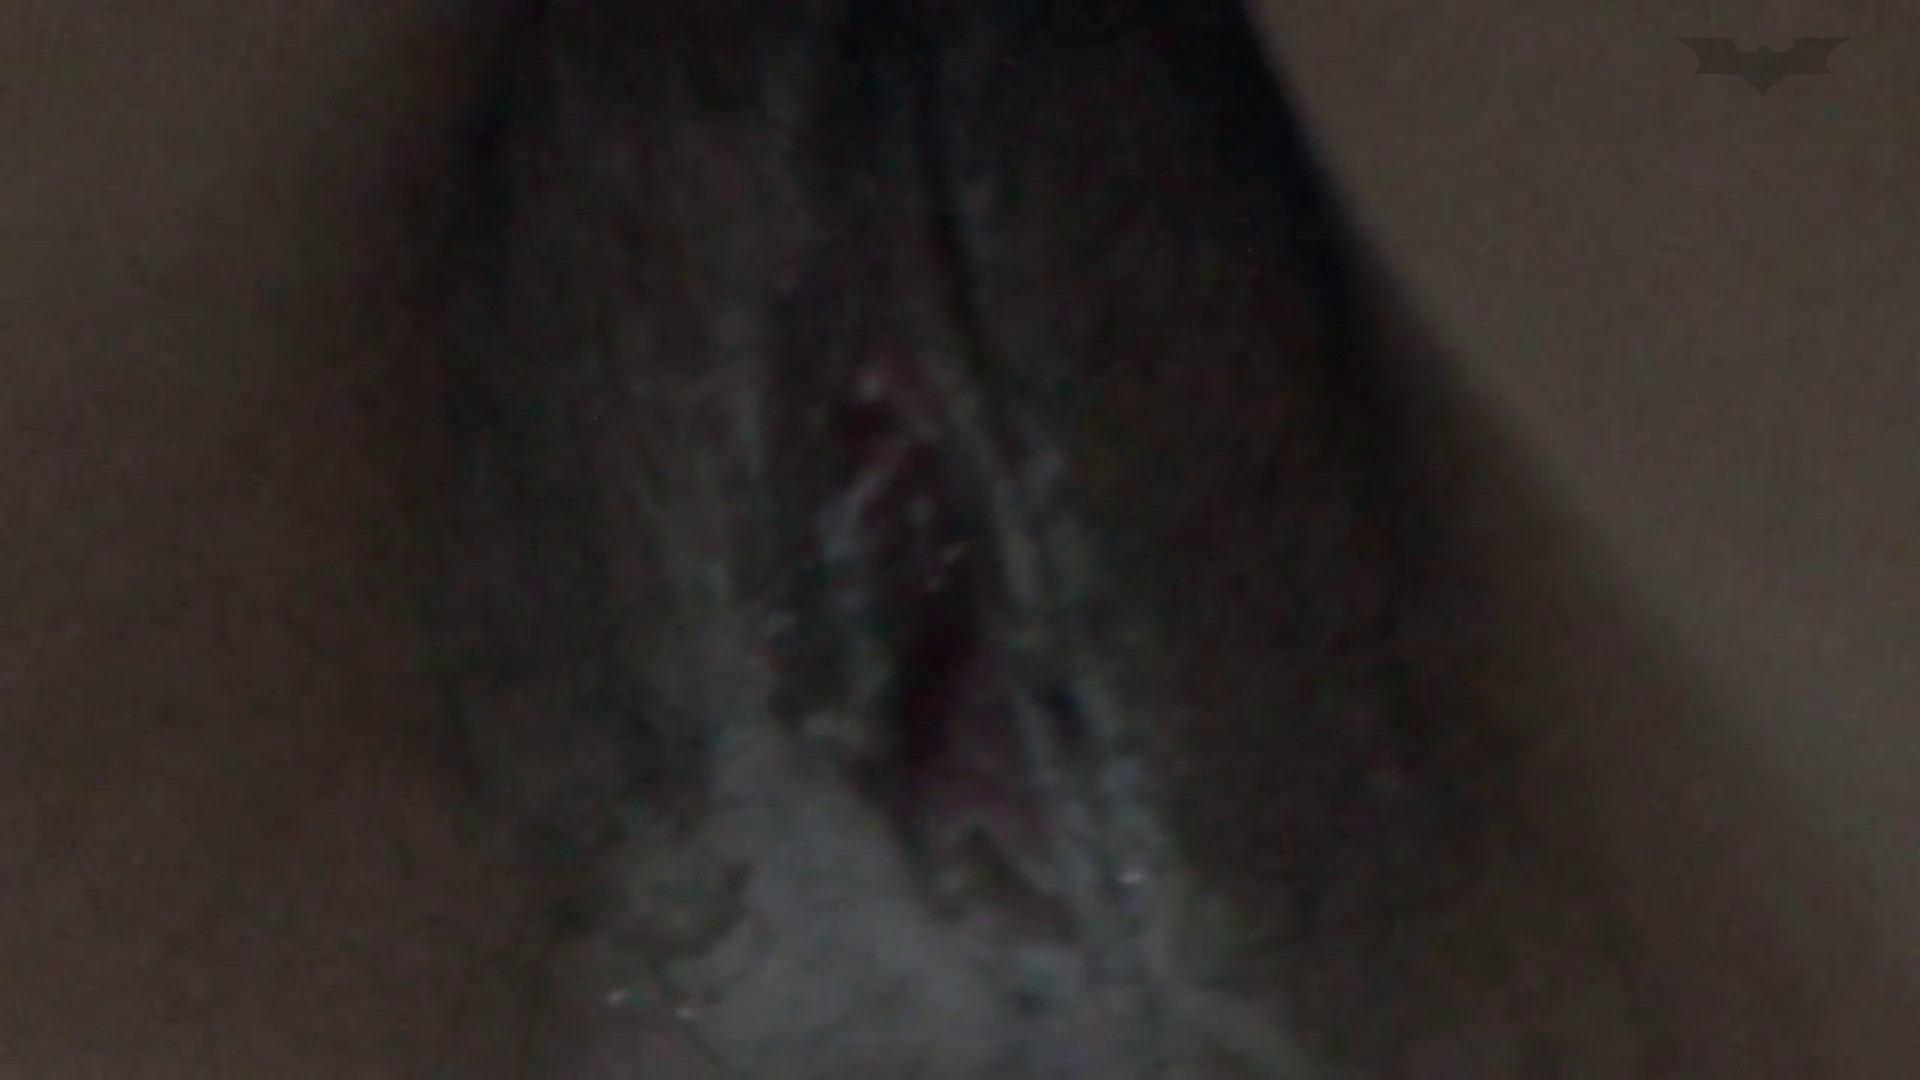 JD盗撮 美女の洗面所の秘密 Vol.44 ガールの盗撮 盗撮動画紹介 64枚